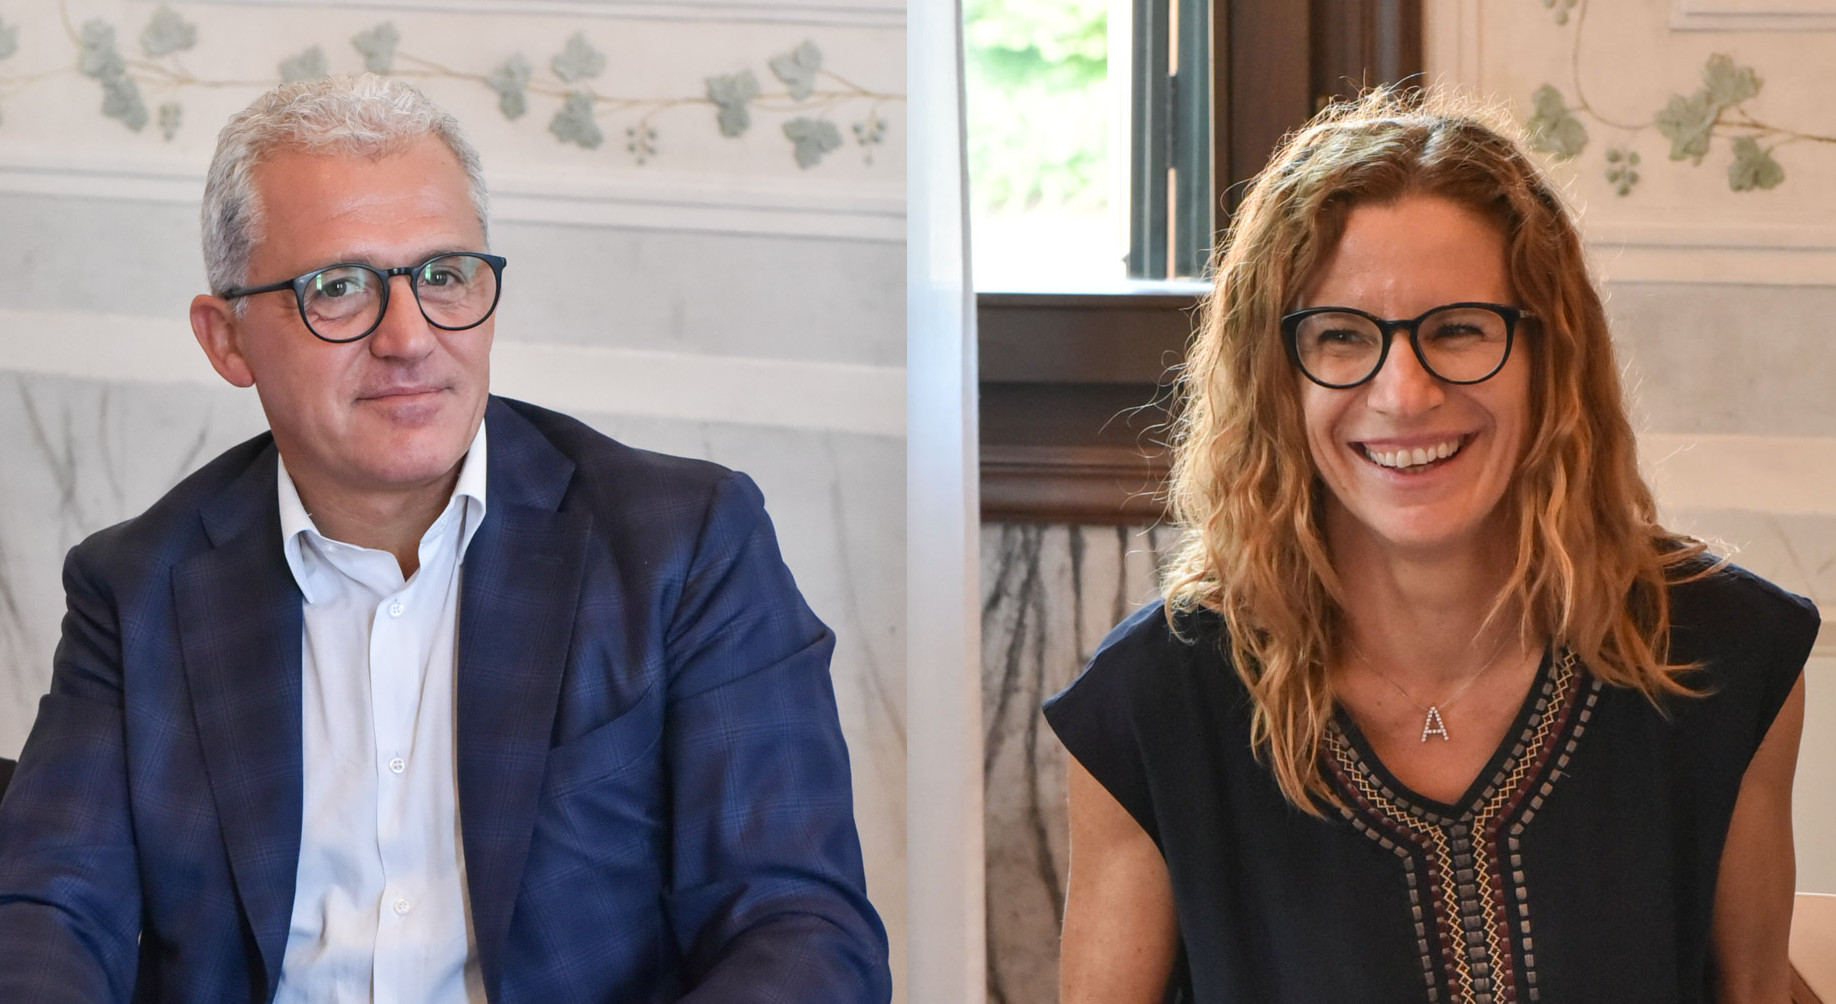 Mario Ravagnan e Antonella Candiotto